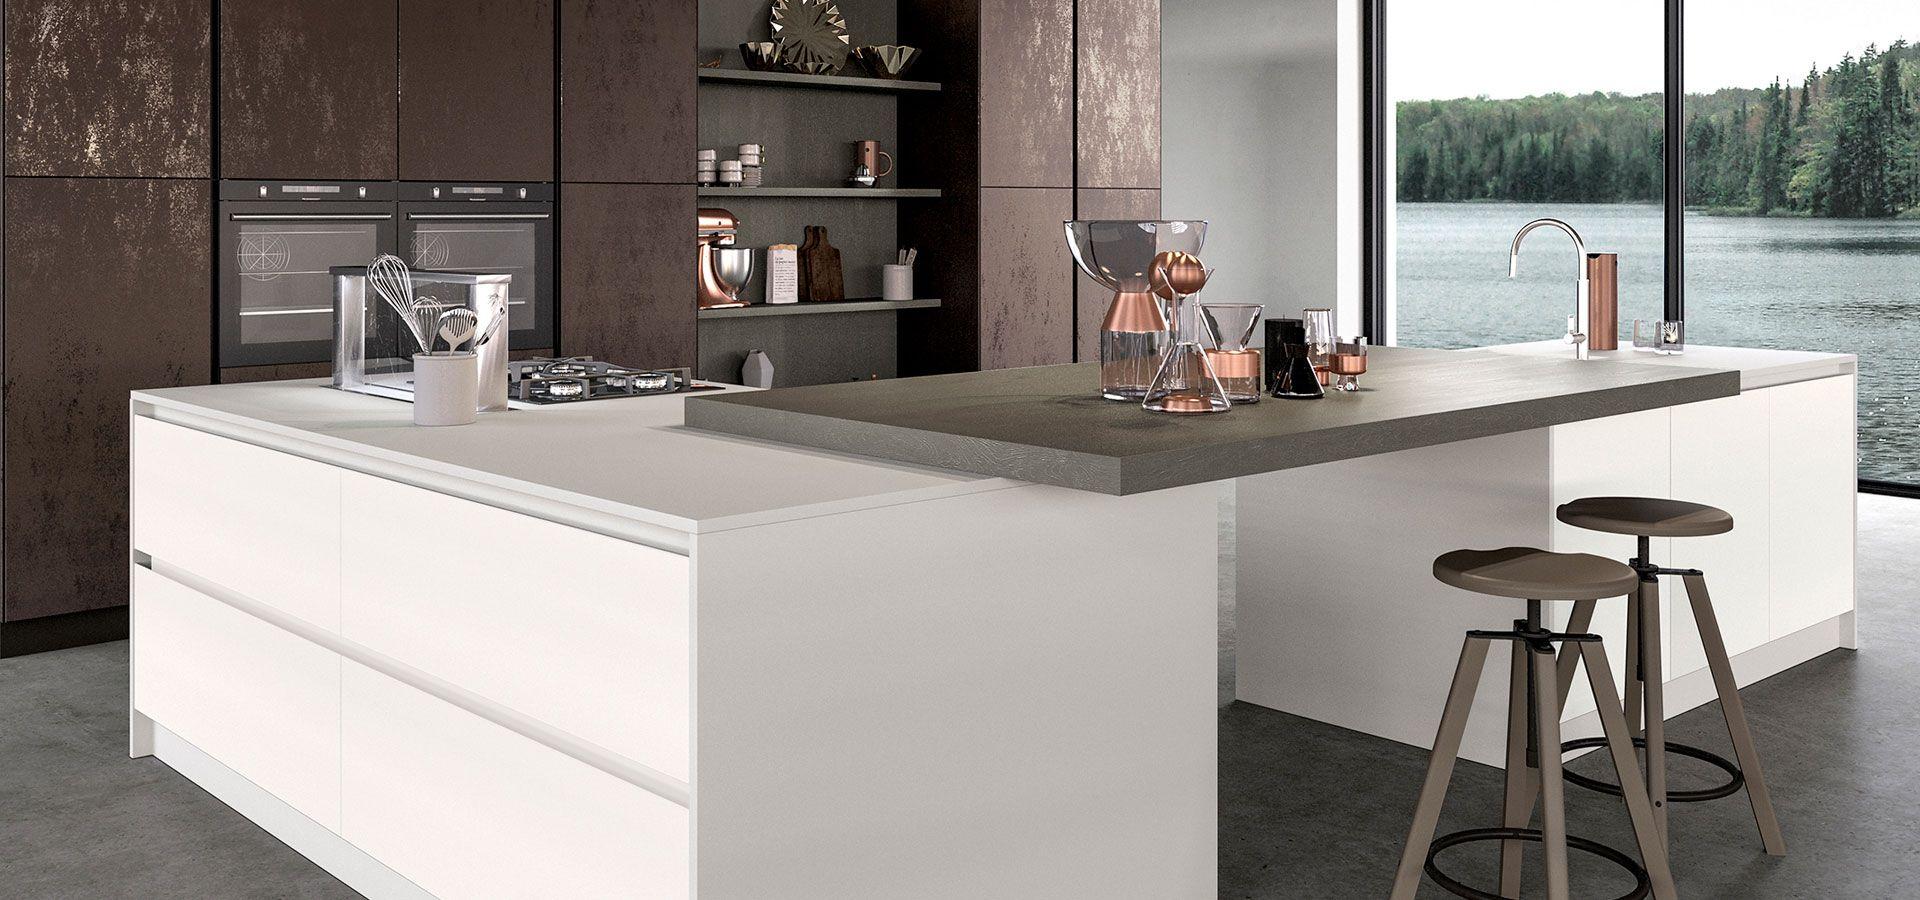 Cucina moderna design ante in vetro lucido opaco glass - Ante in vetro cucina ...